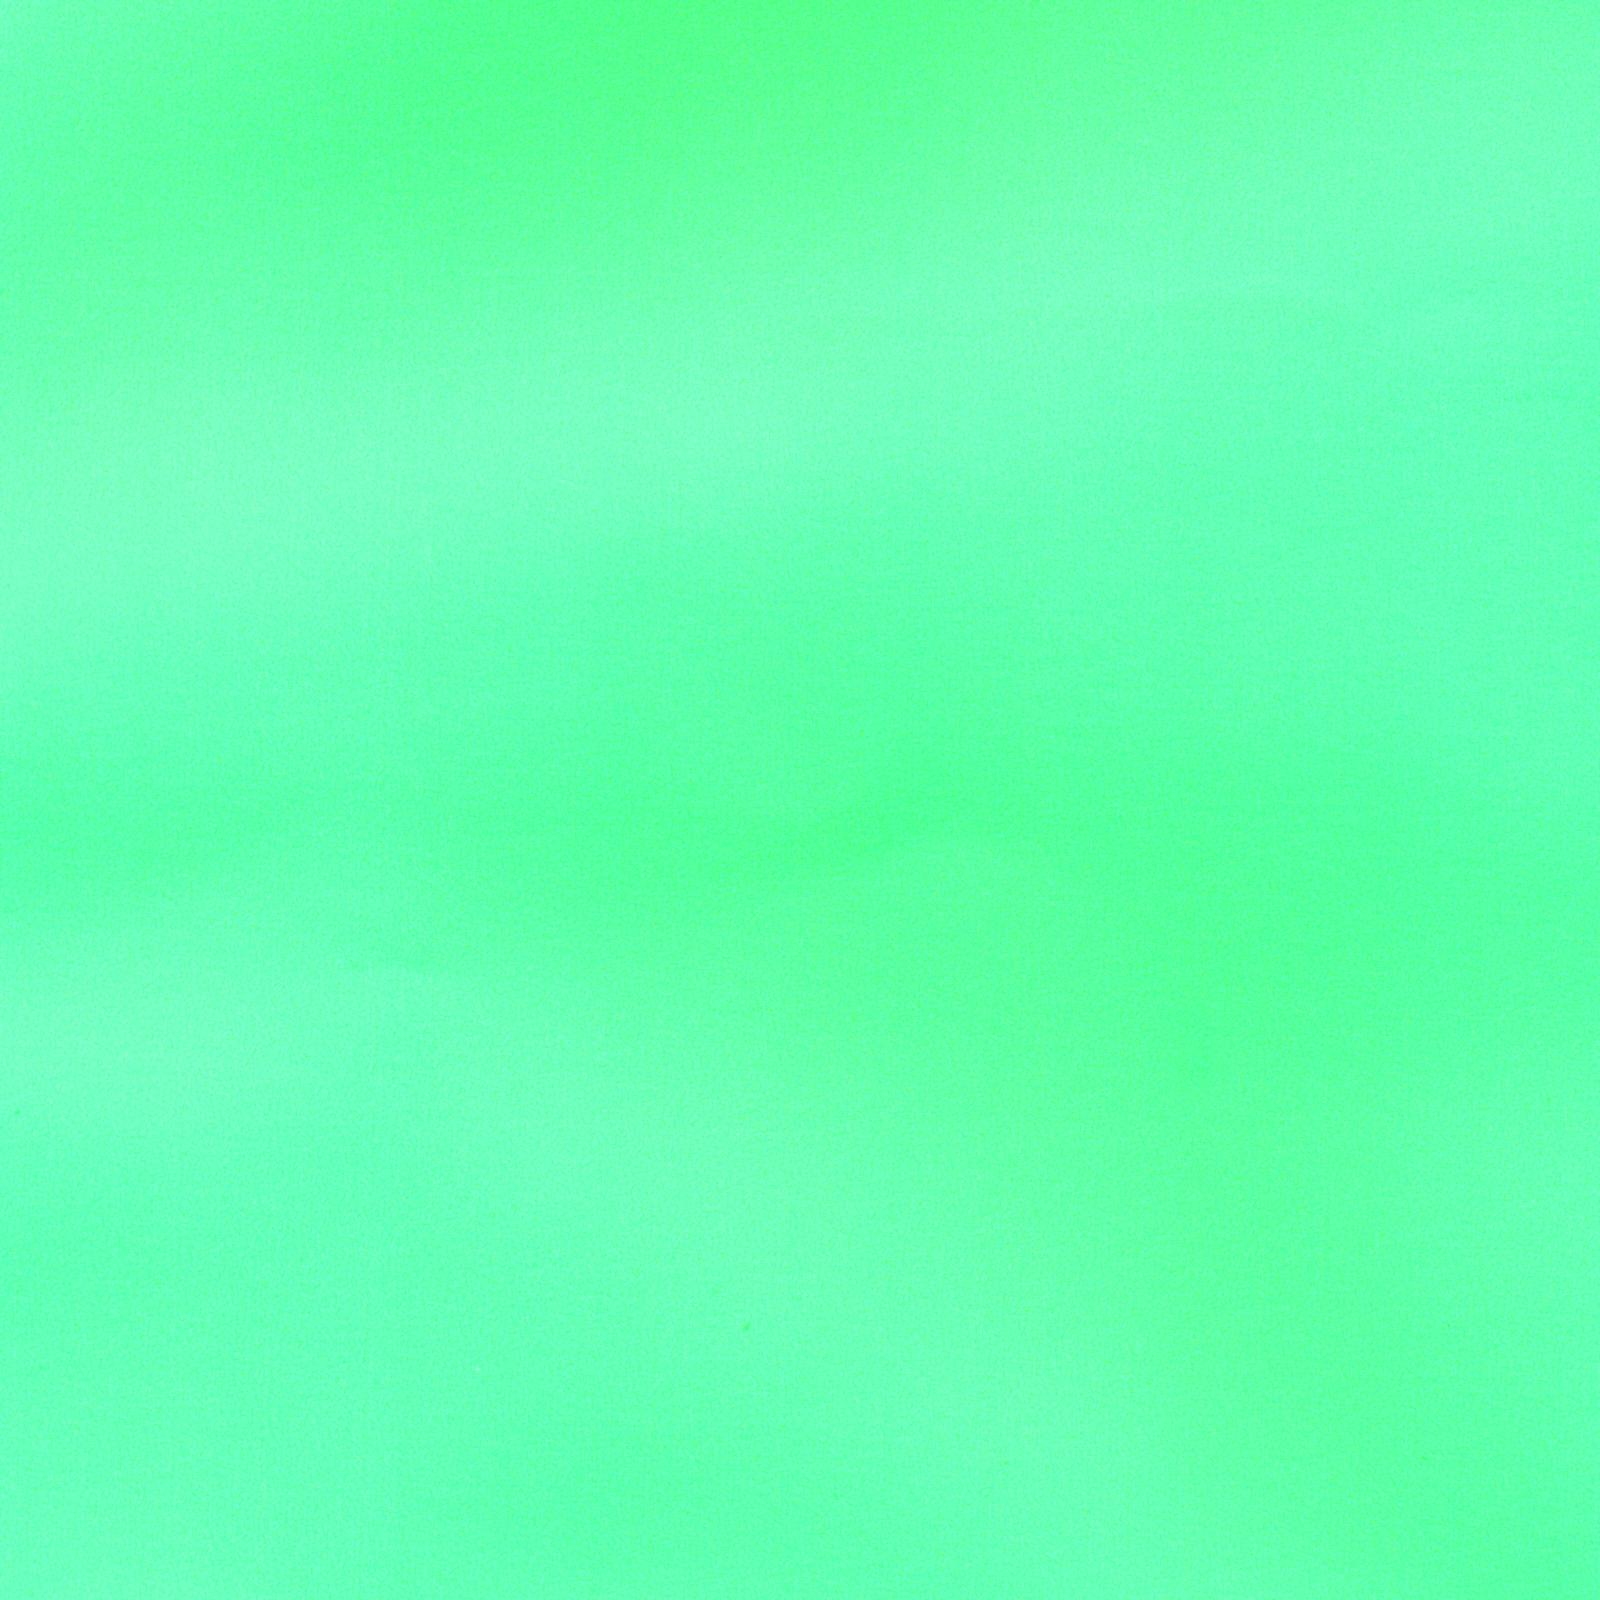 Matte Ciel Bleu Tinted White Kraft Gift Wrap